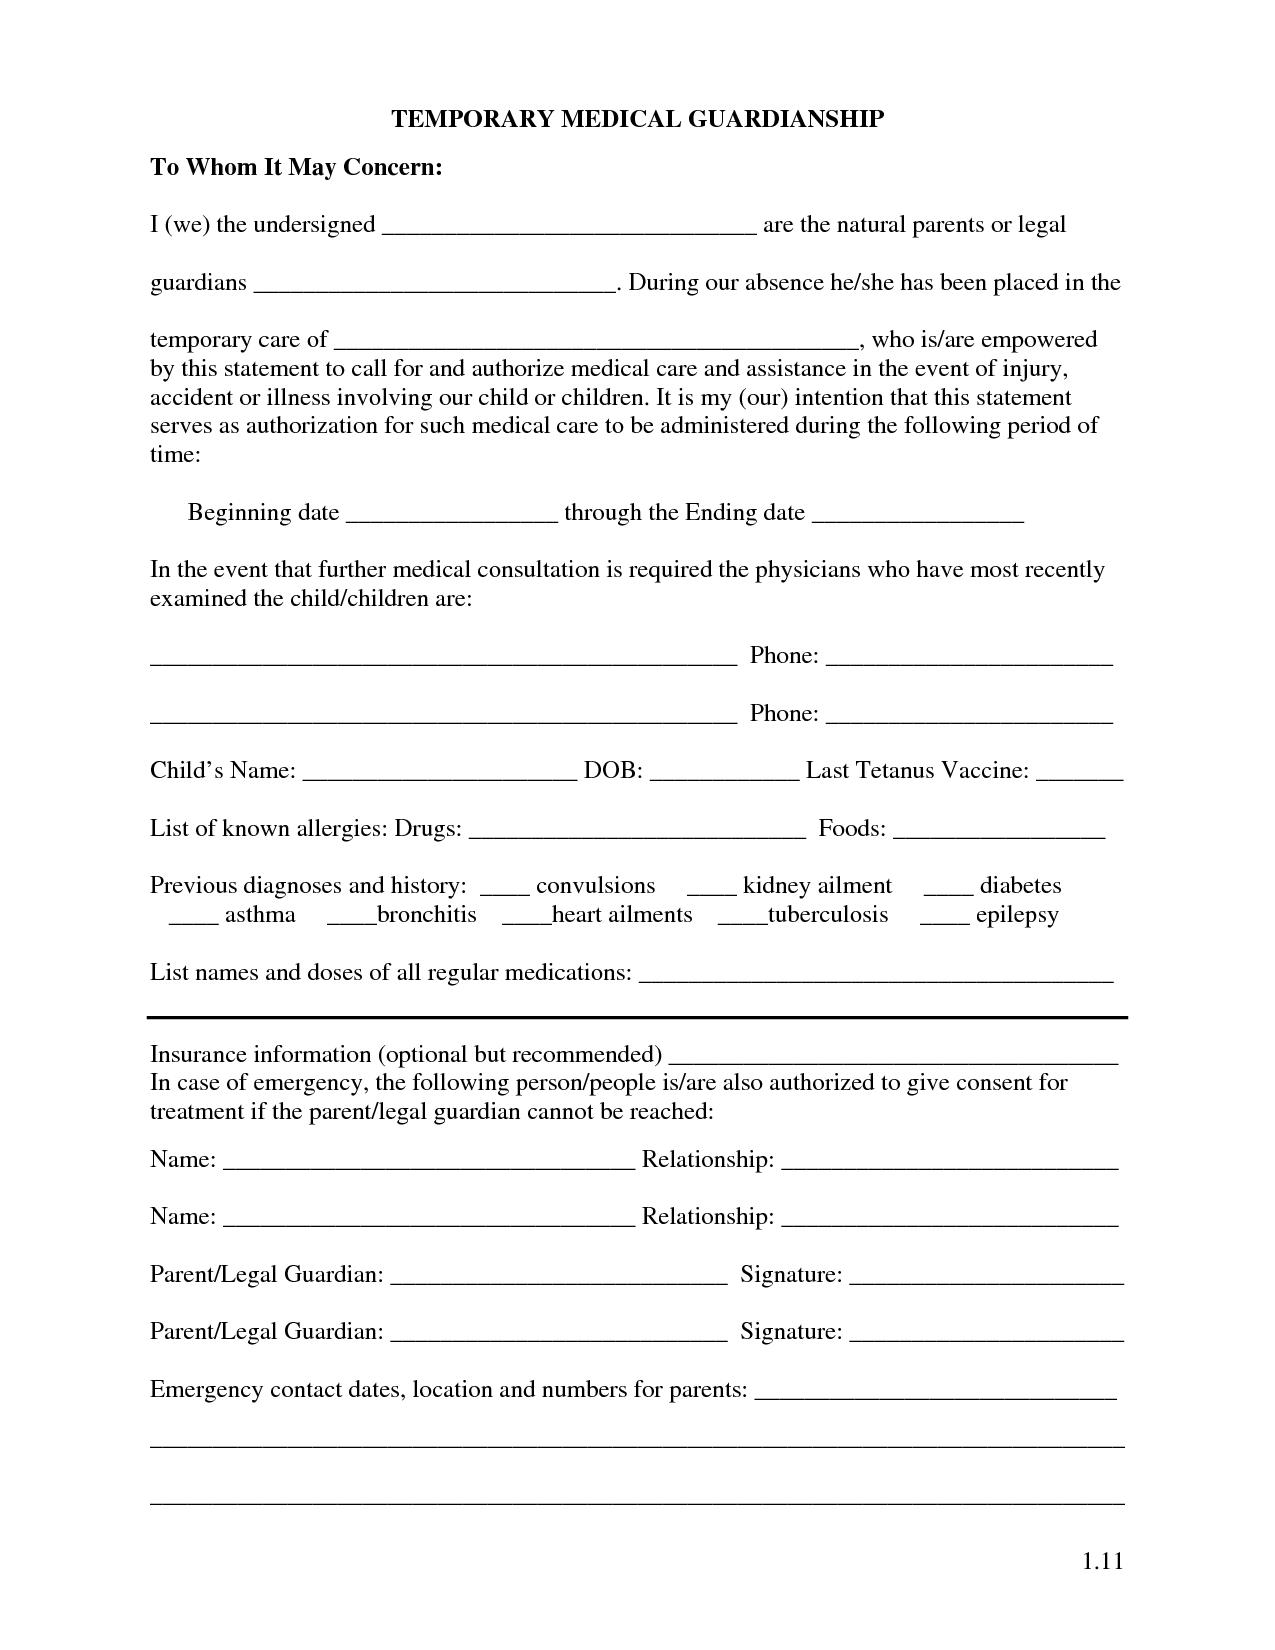 Free Printable Temporary Guardianship Forms | Forms | Child Custody - Free Printable Temporary Guardianship Form